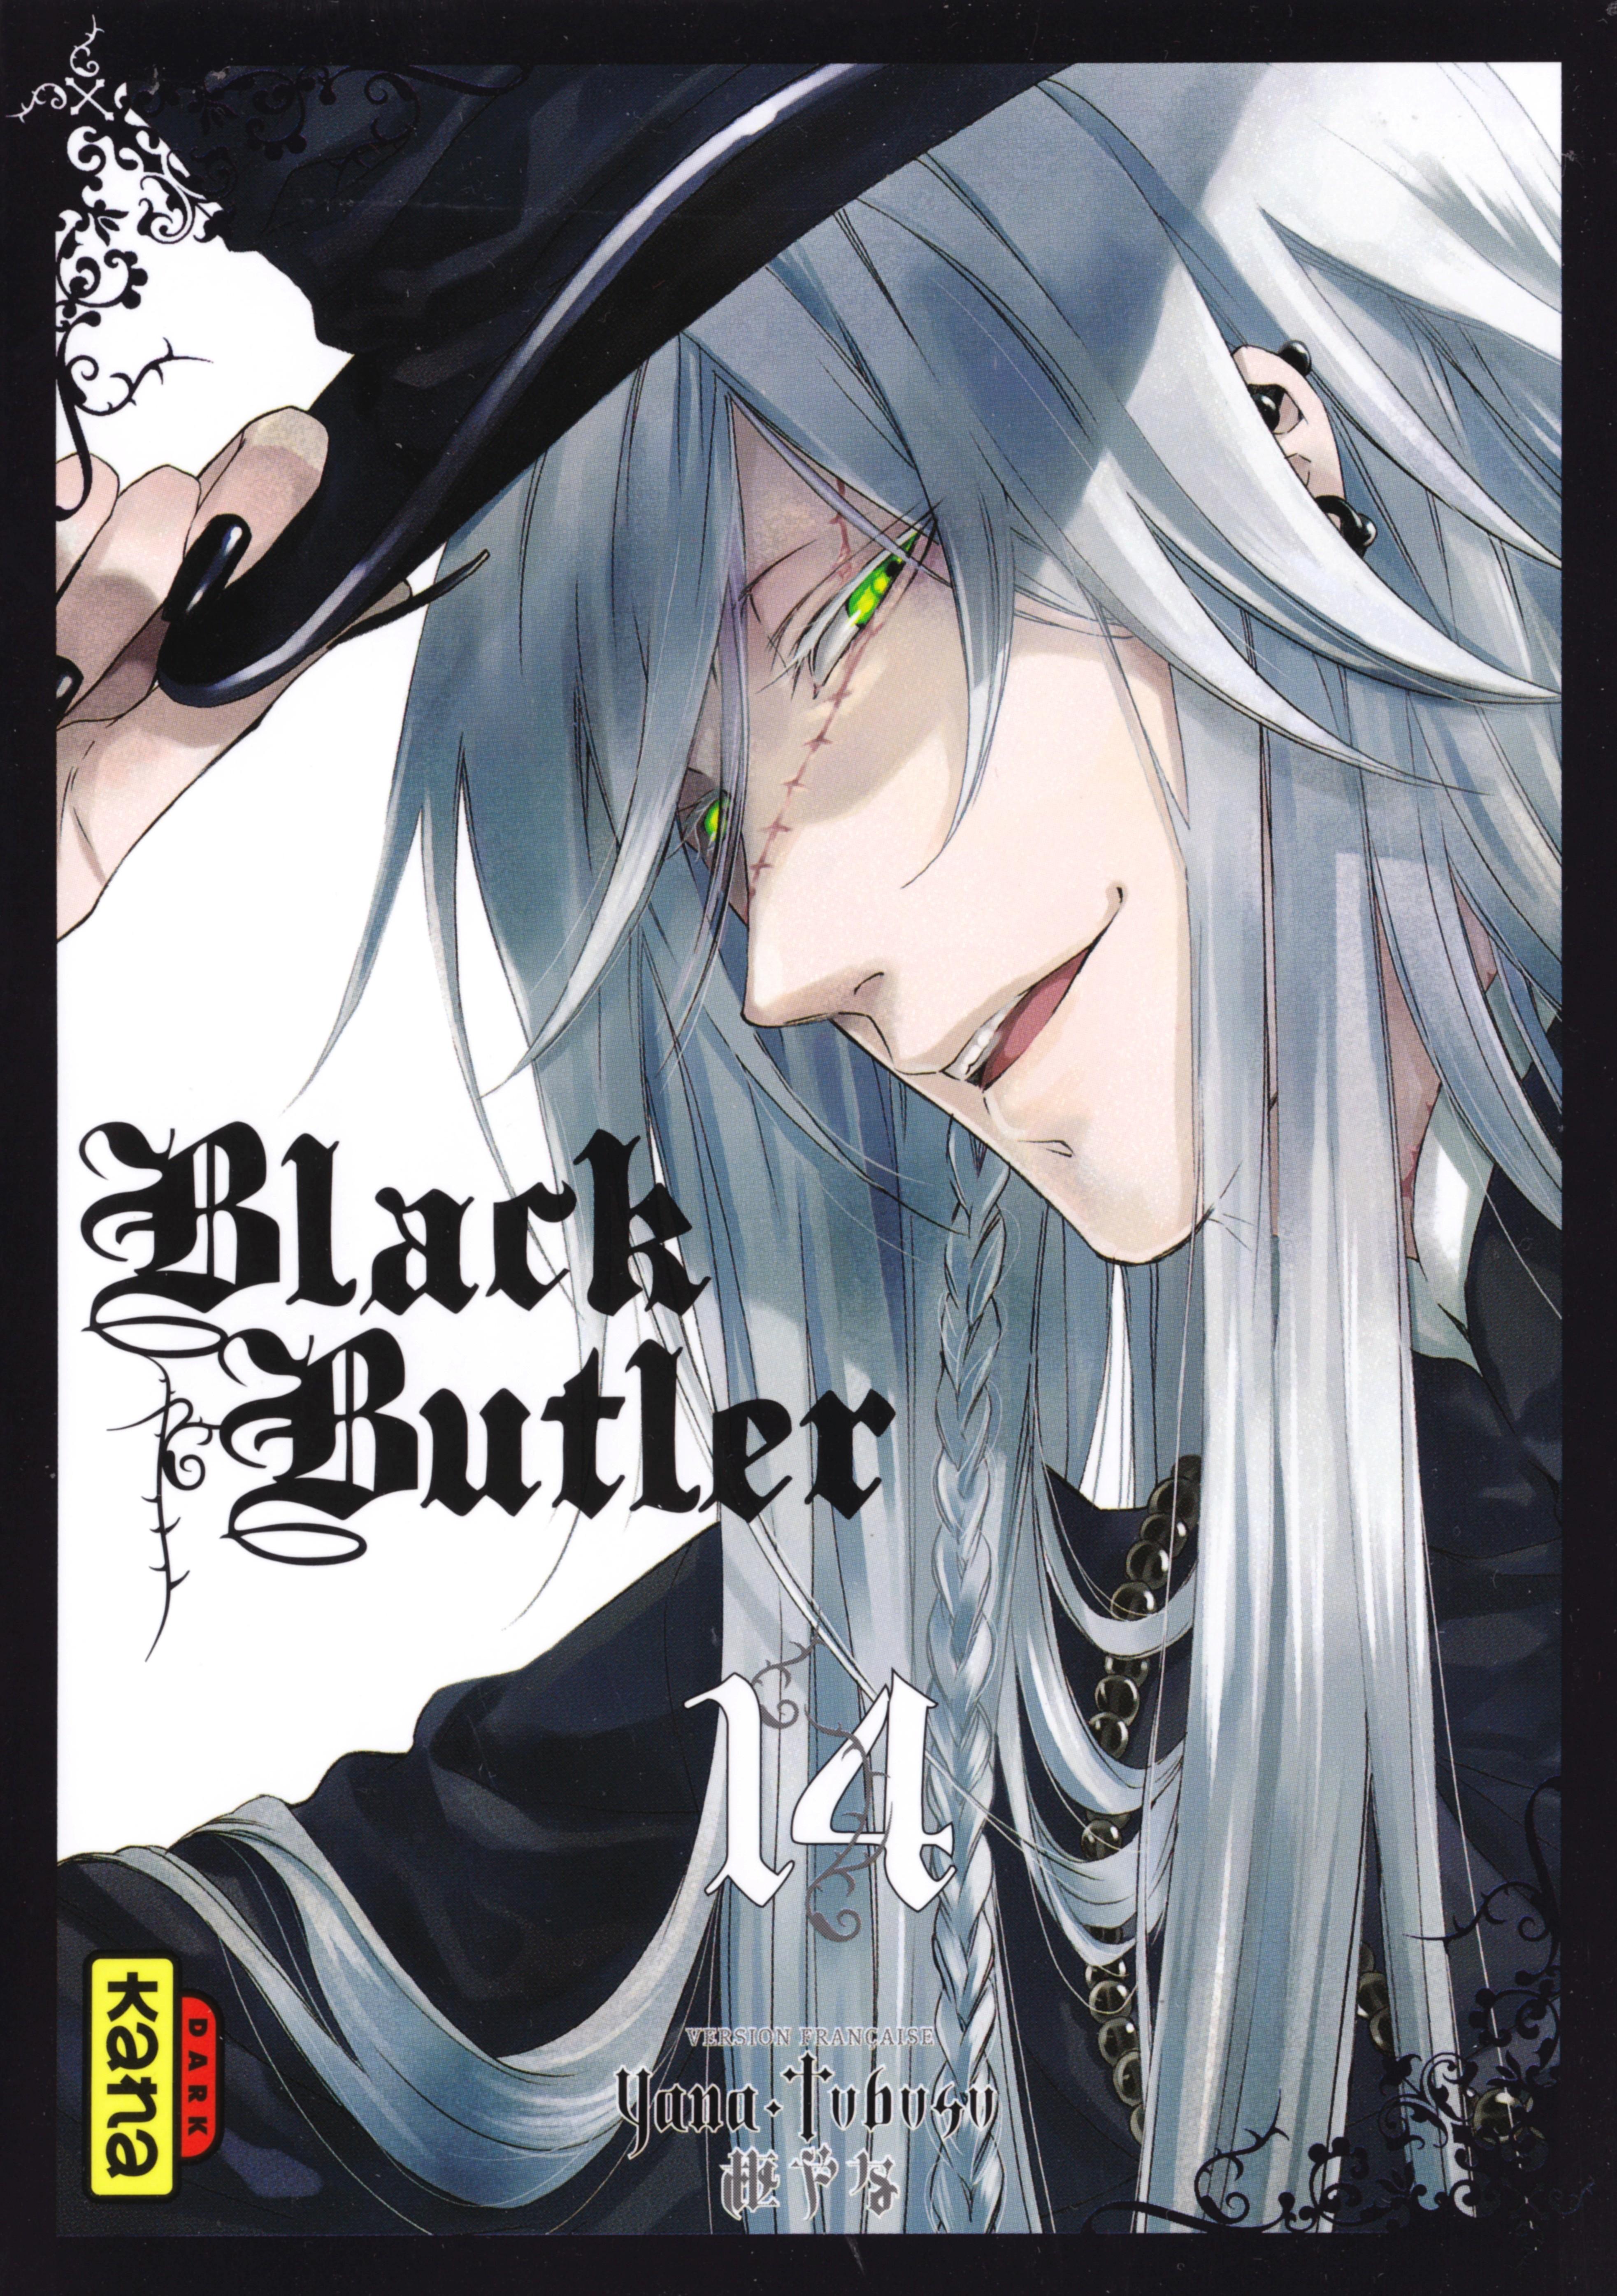 Undertaker - Kuroshitsuji - Mobile Wallpaper #1608602 ...